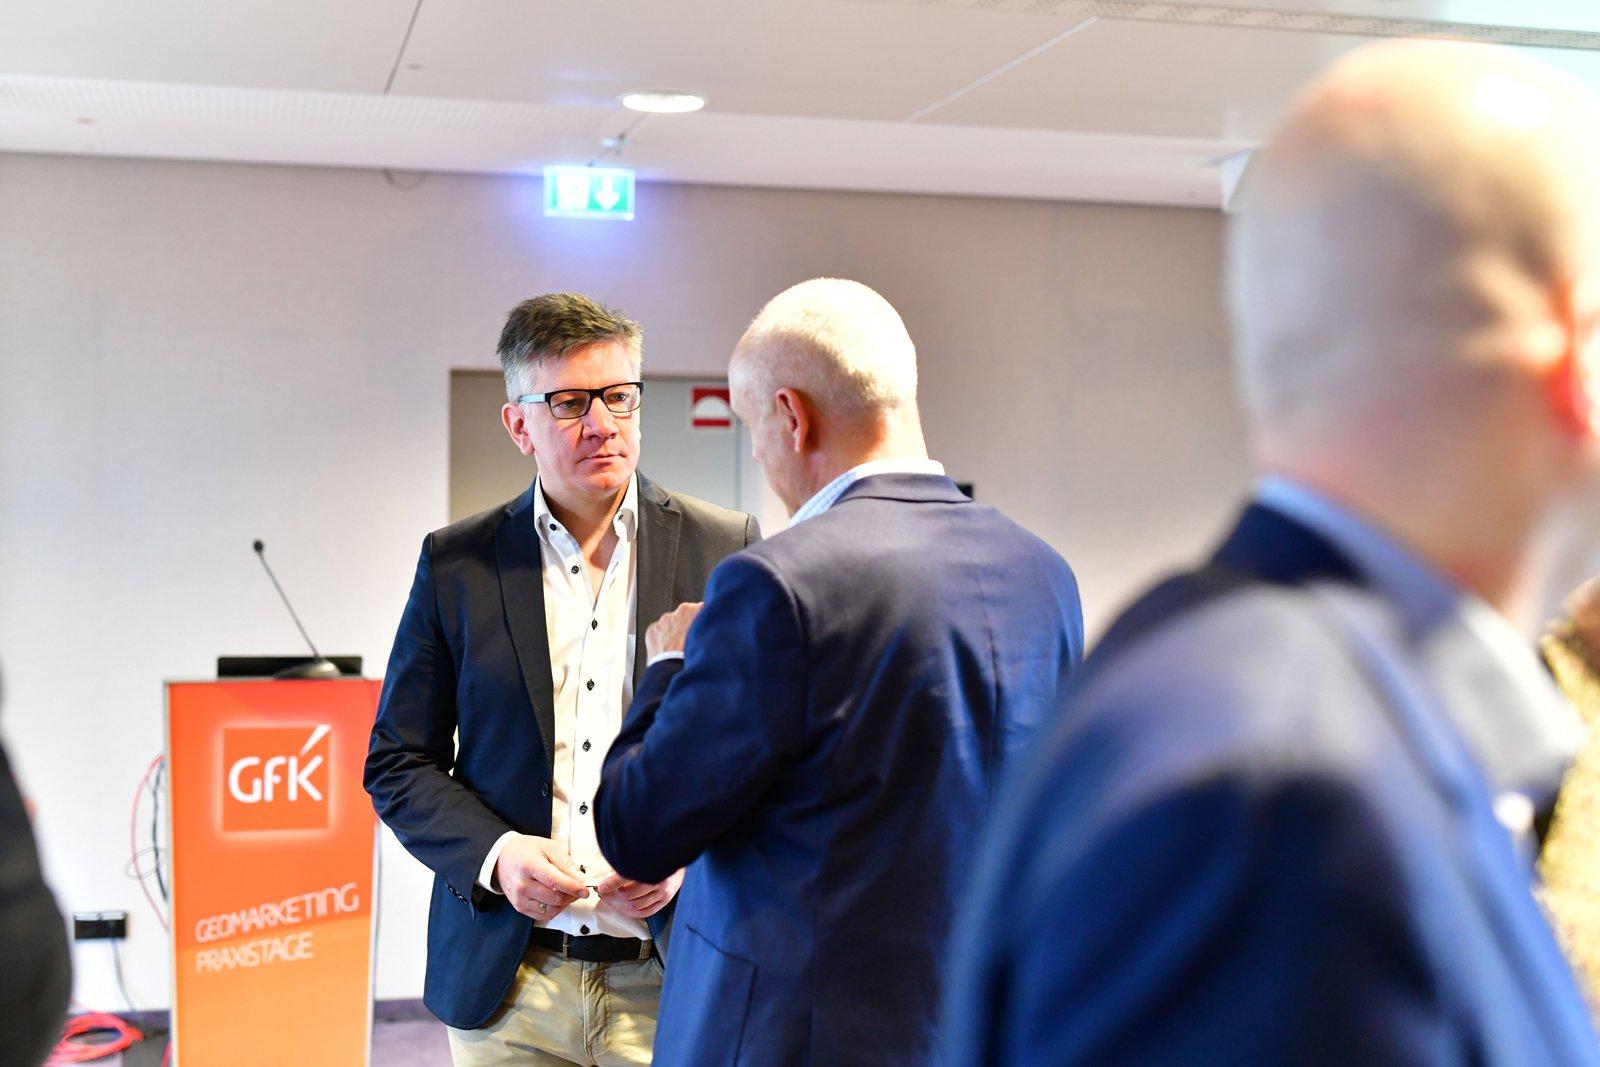 Geomarketing Praxistag 2019